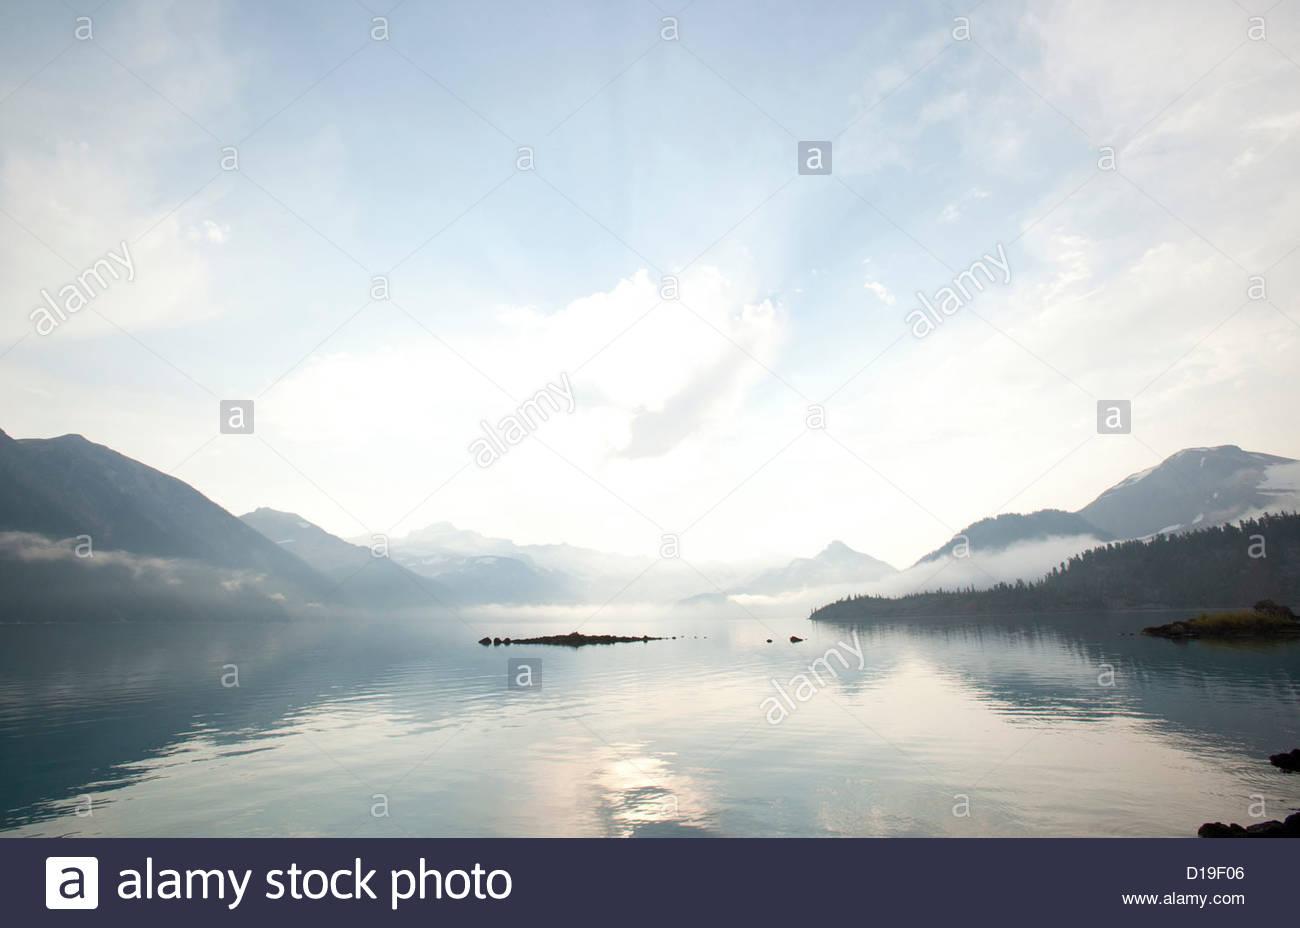 Peaceful scene over lake, Garibaldi Provincial Park, British Columbia, Canada - Stock Image